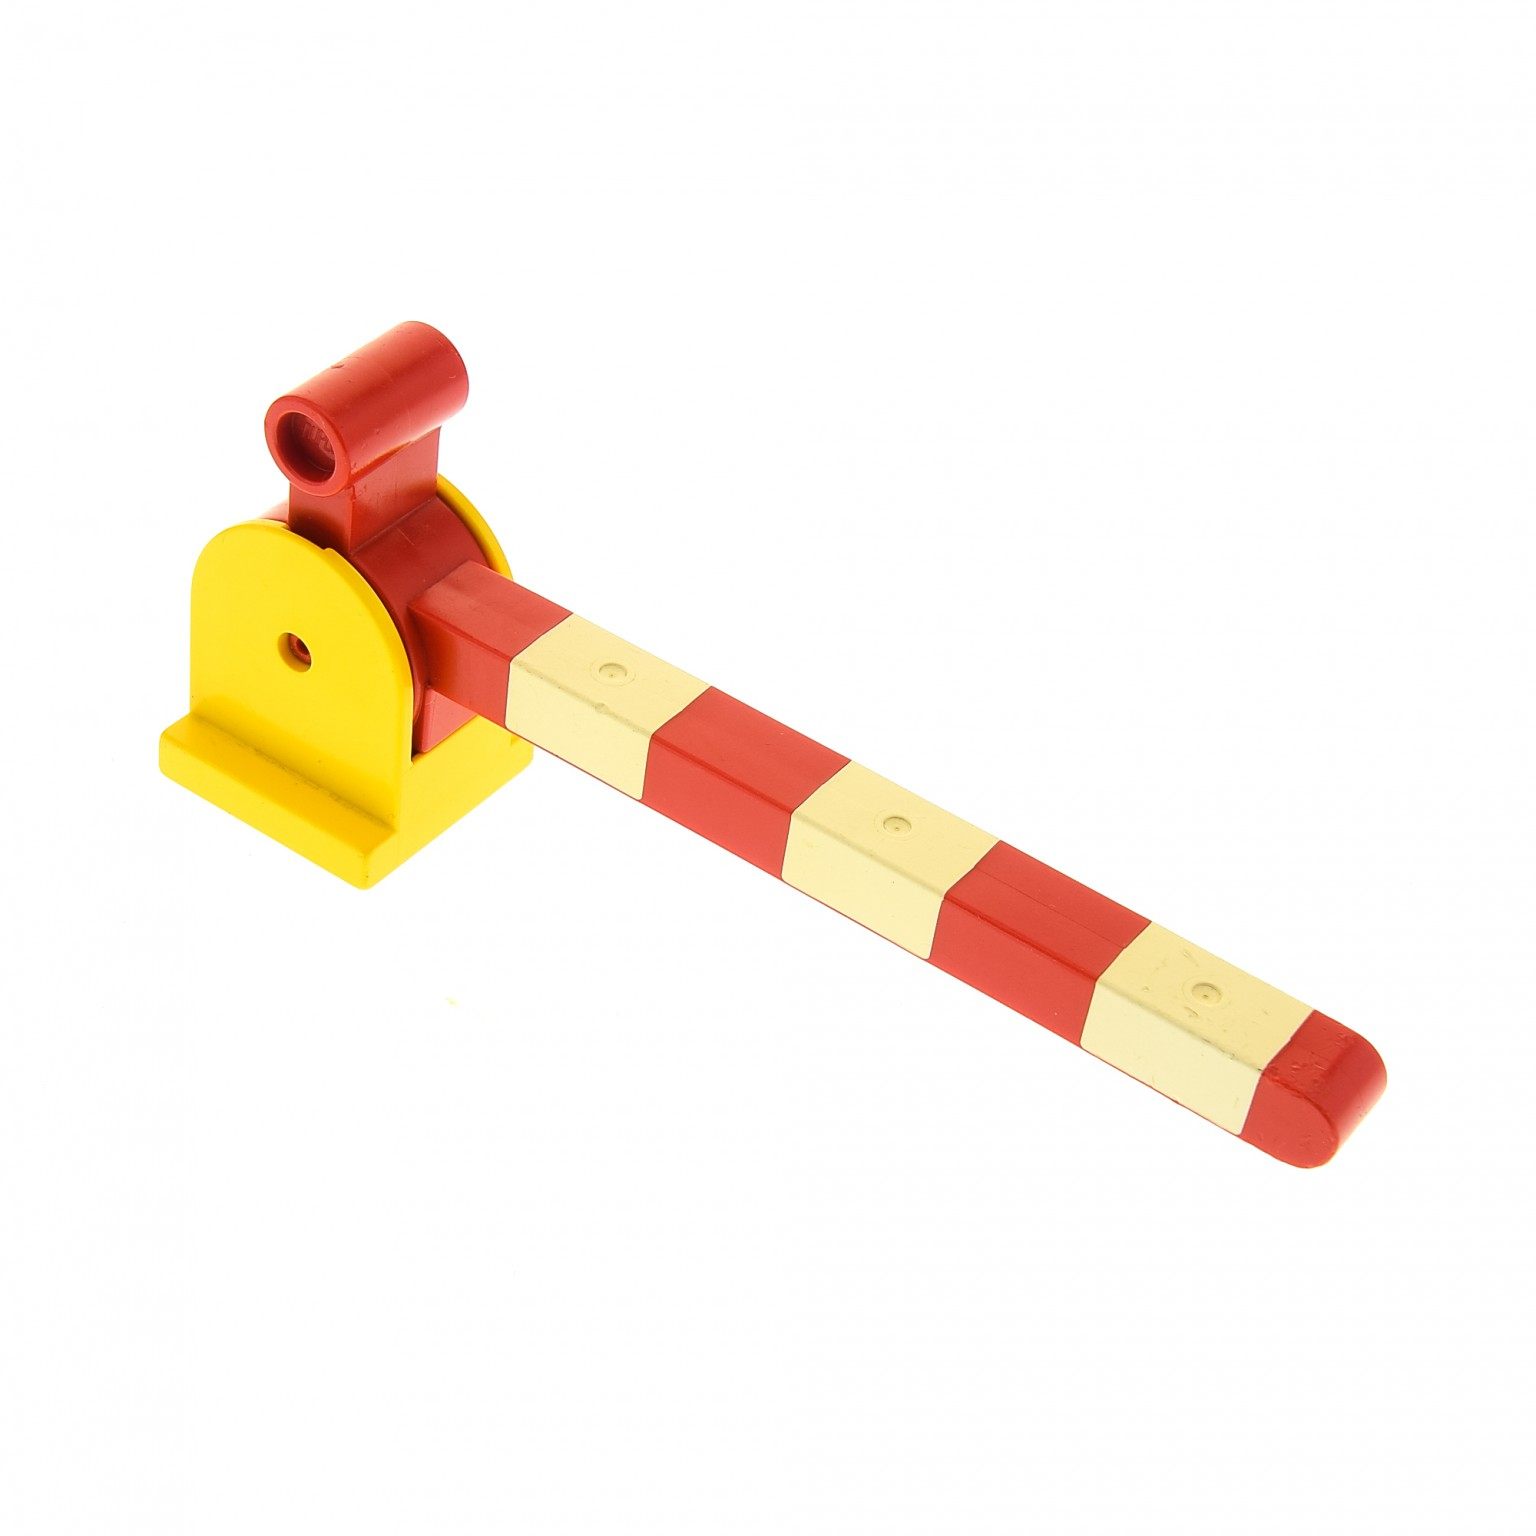 1x Lego Duplo Bahn Schranke gelb weiß rot Hebel lang Übergang 6405c01 vergilbt